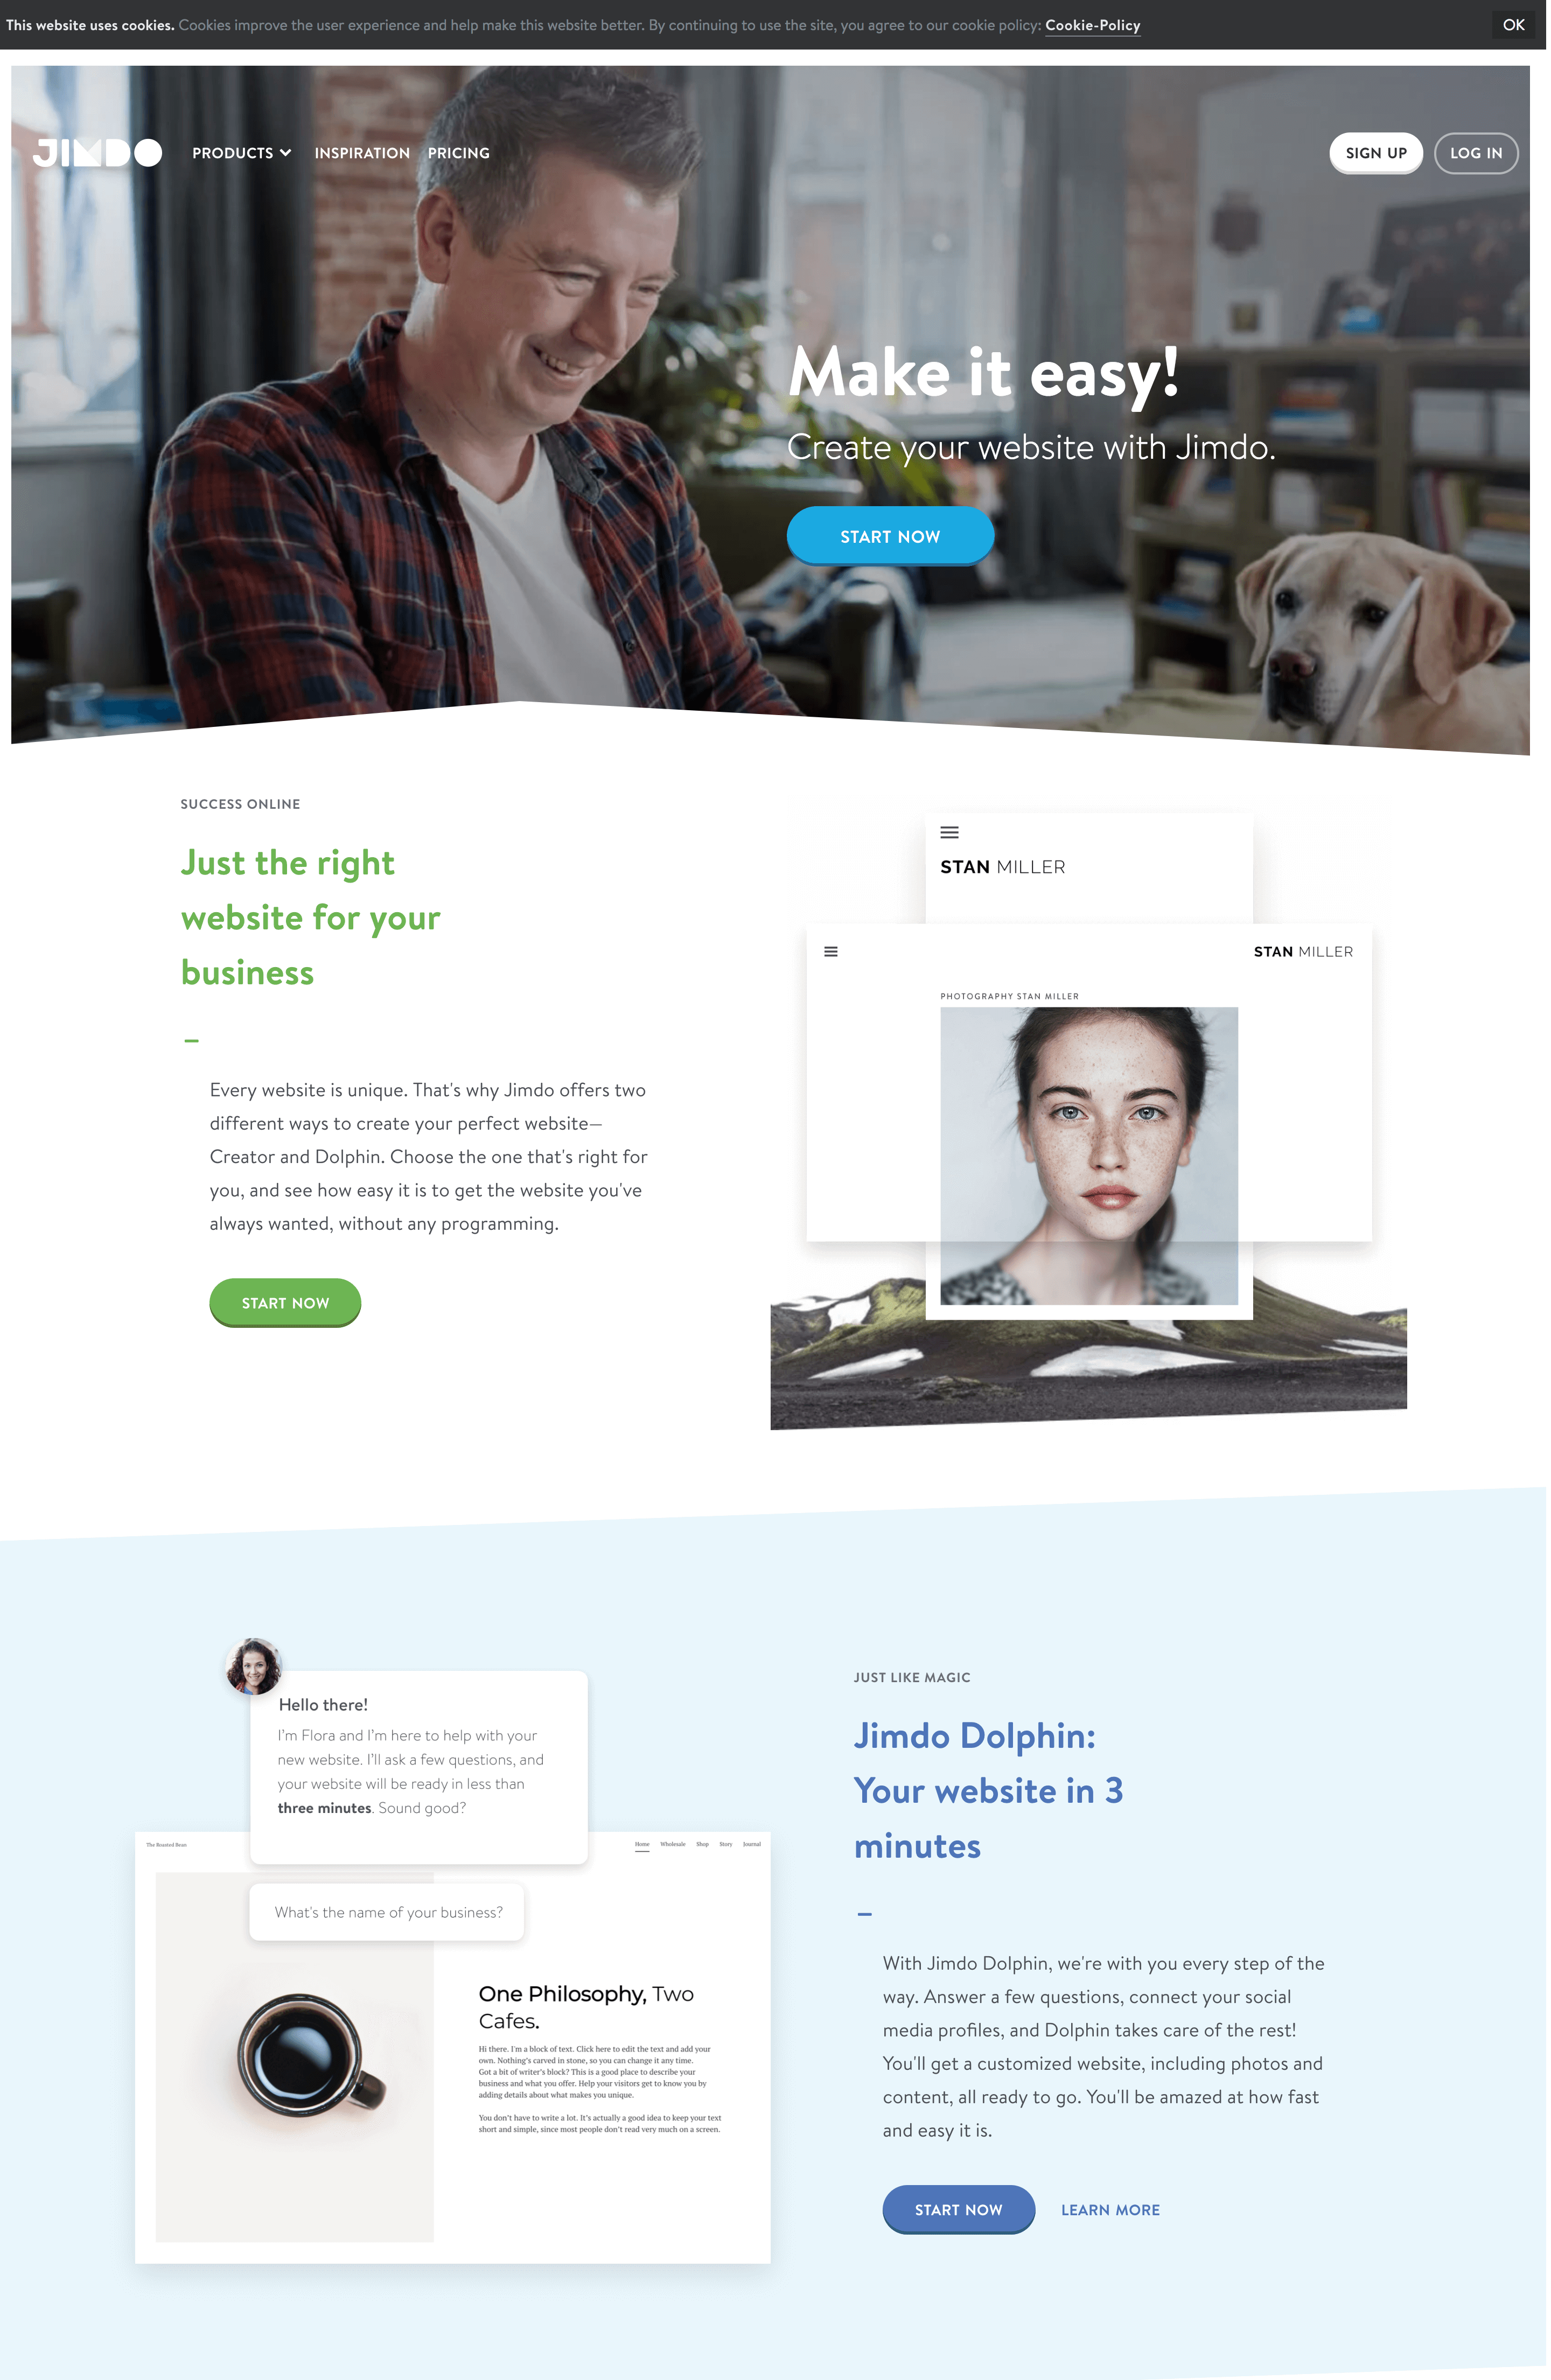 jimdo site homepage